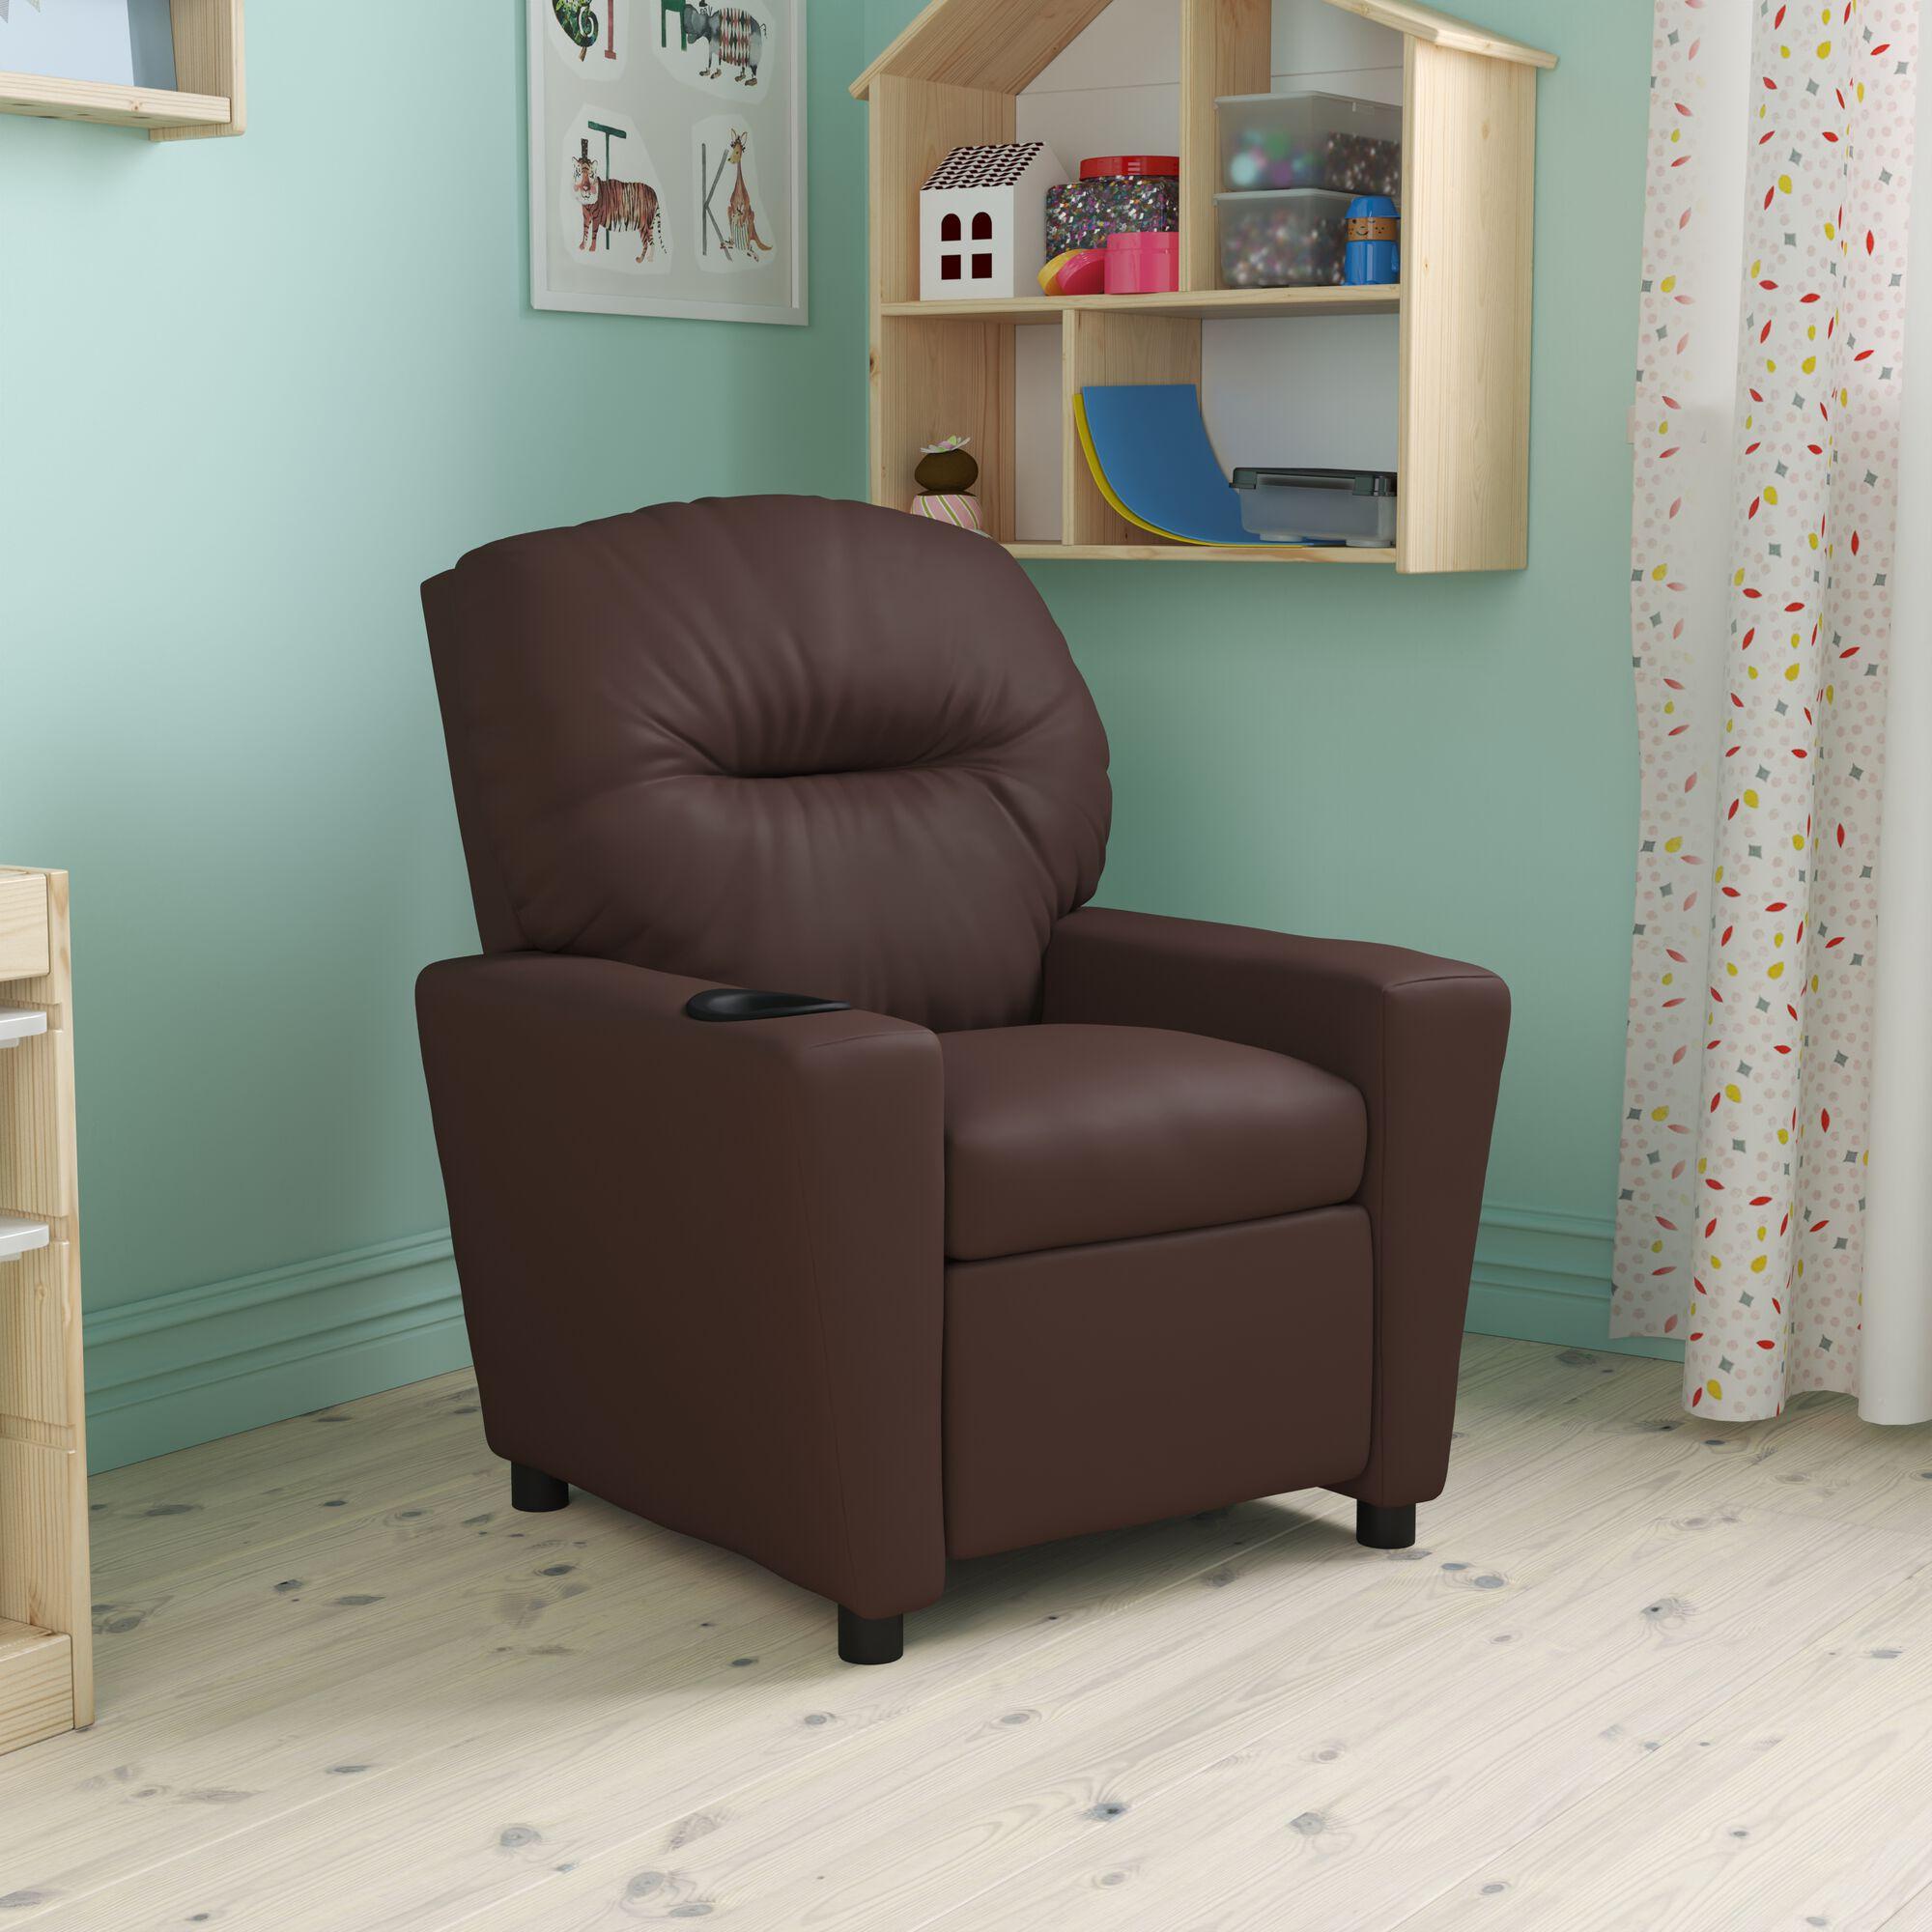 Brown Leather Kids Recliner BT 7950 KID BRN LEA GG